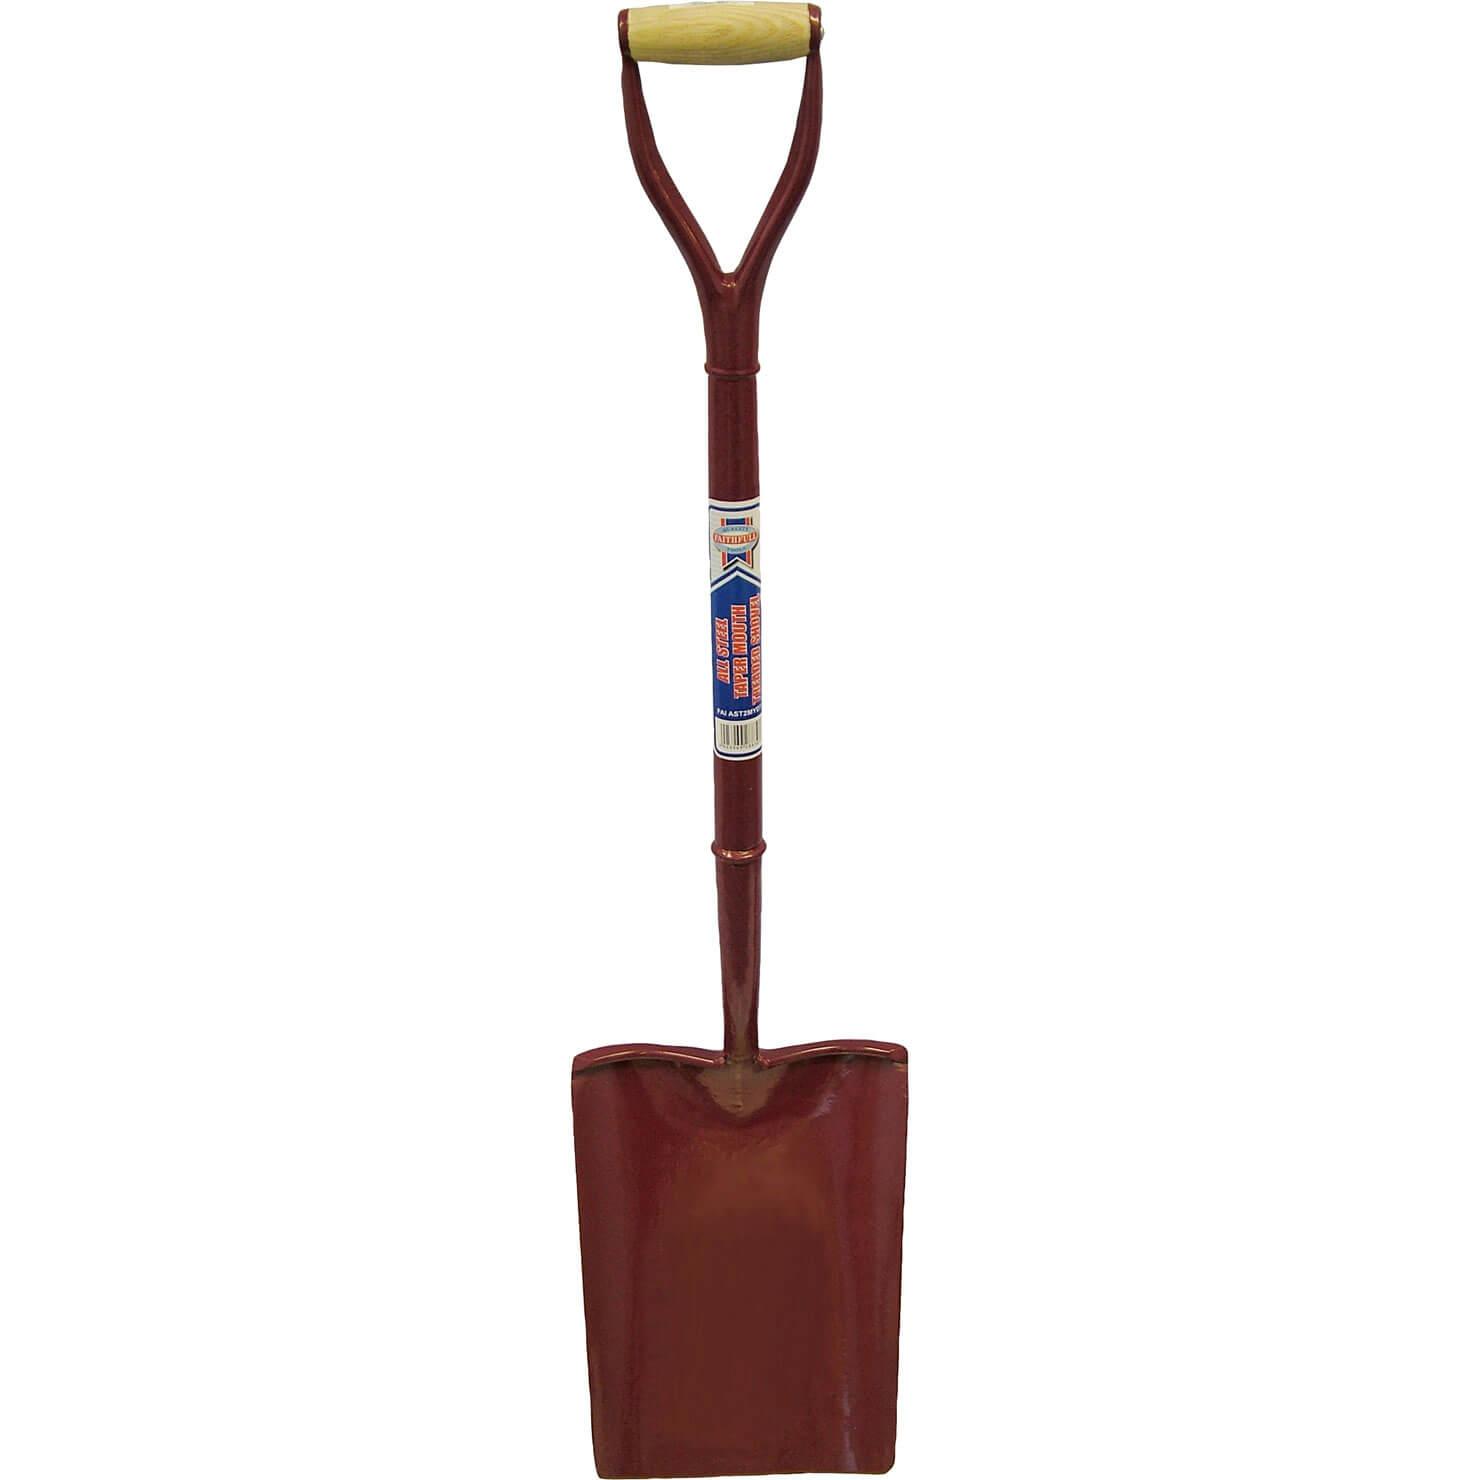 Faithfull All Steel Taper Mouth Shovel Size 2 700mm Handle